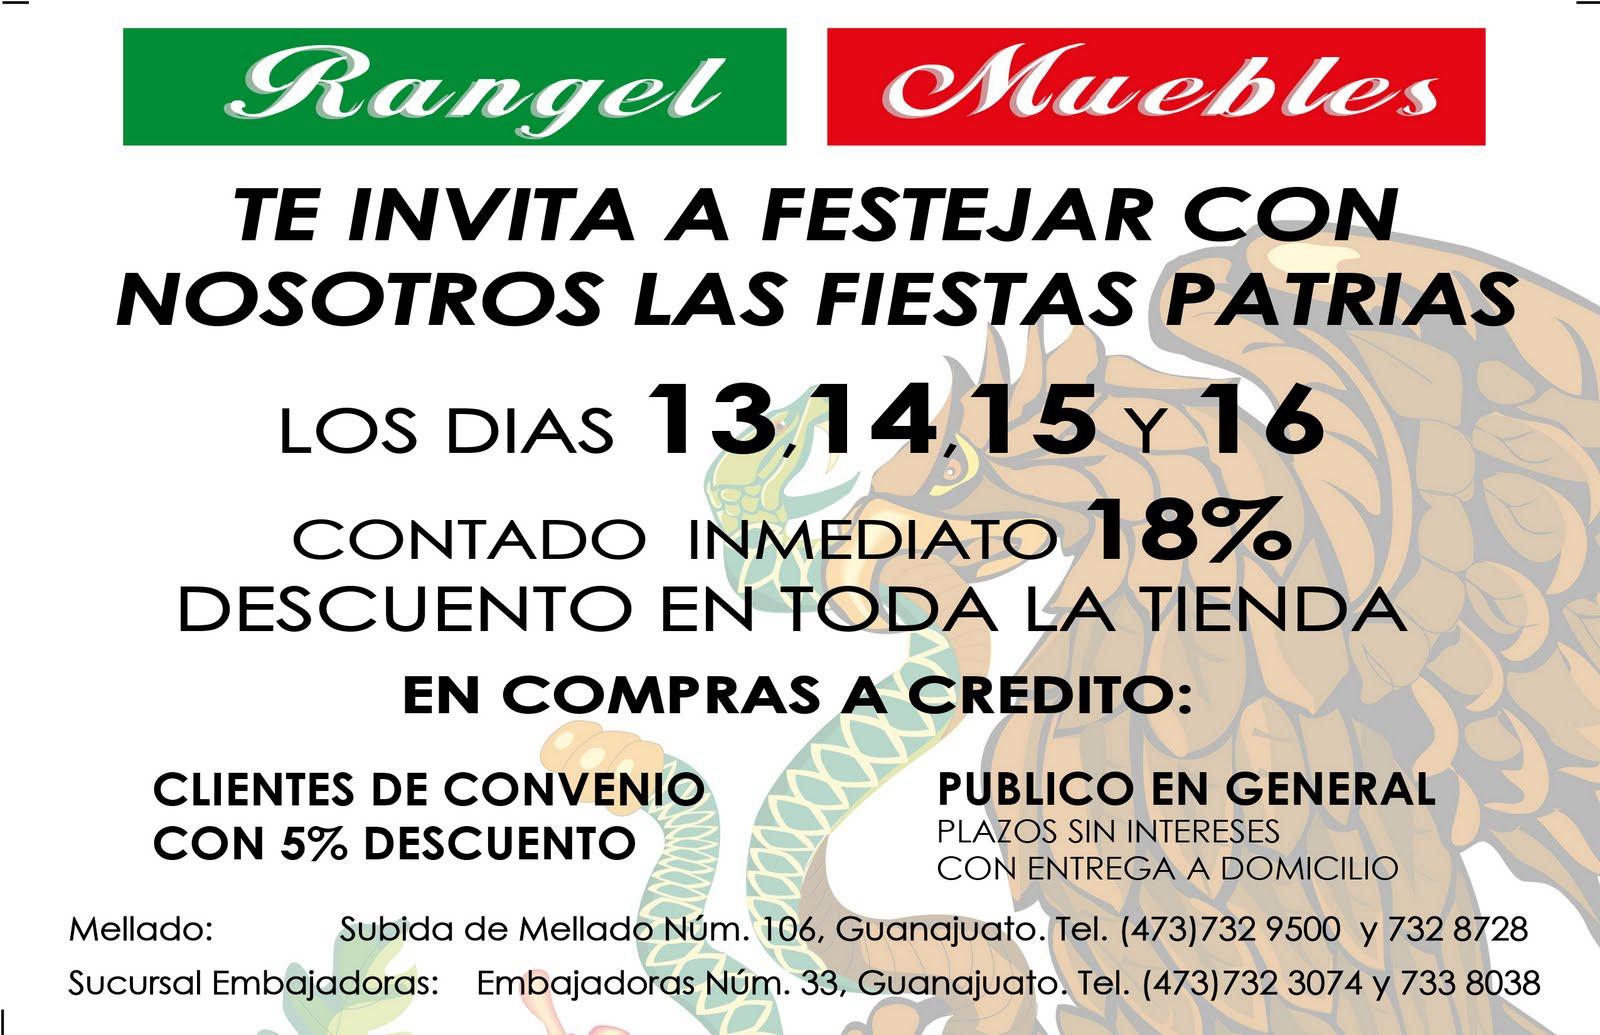 Muebles Rangel Guanajuato - 16sep 01 Jpg[mjhdah]https://s-media-cache-ak0.pinimg.com/originals/47/ed/1d/47ed1d1165f8defaafec0b75c3efbbb3.jpg